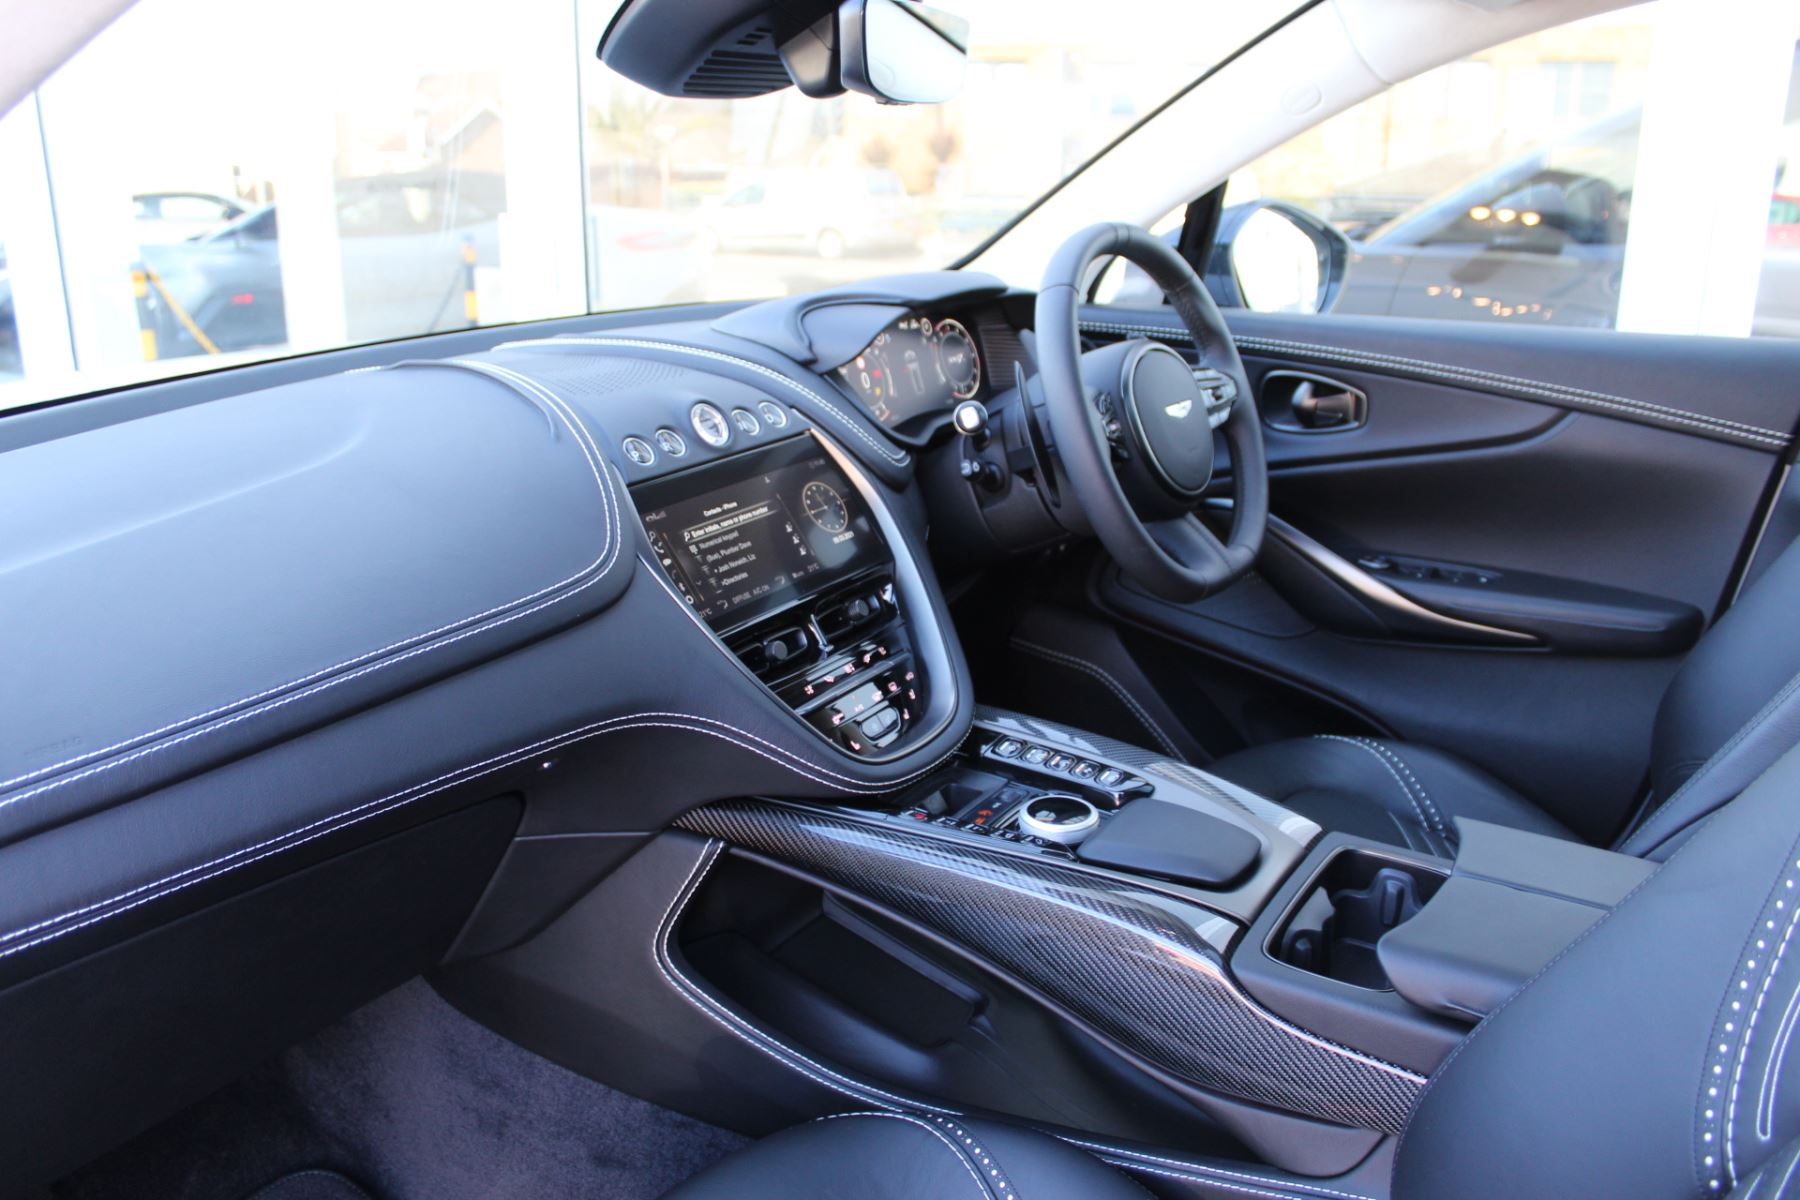 Aston Martin DBX V8 Twin Turbo Massive Spec Low mileage image 3